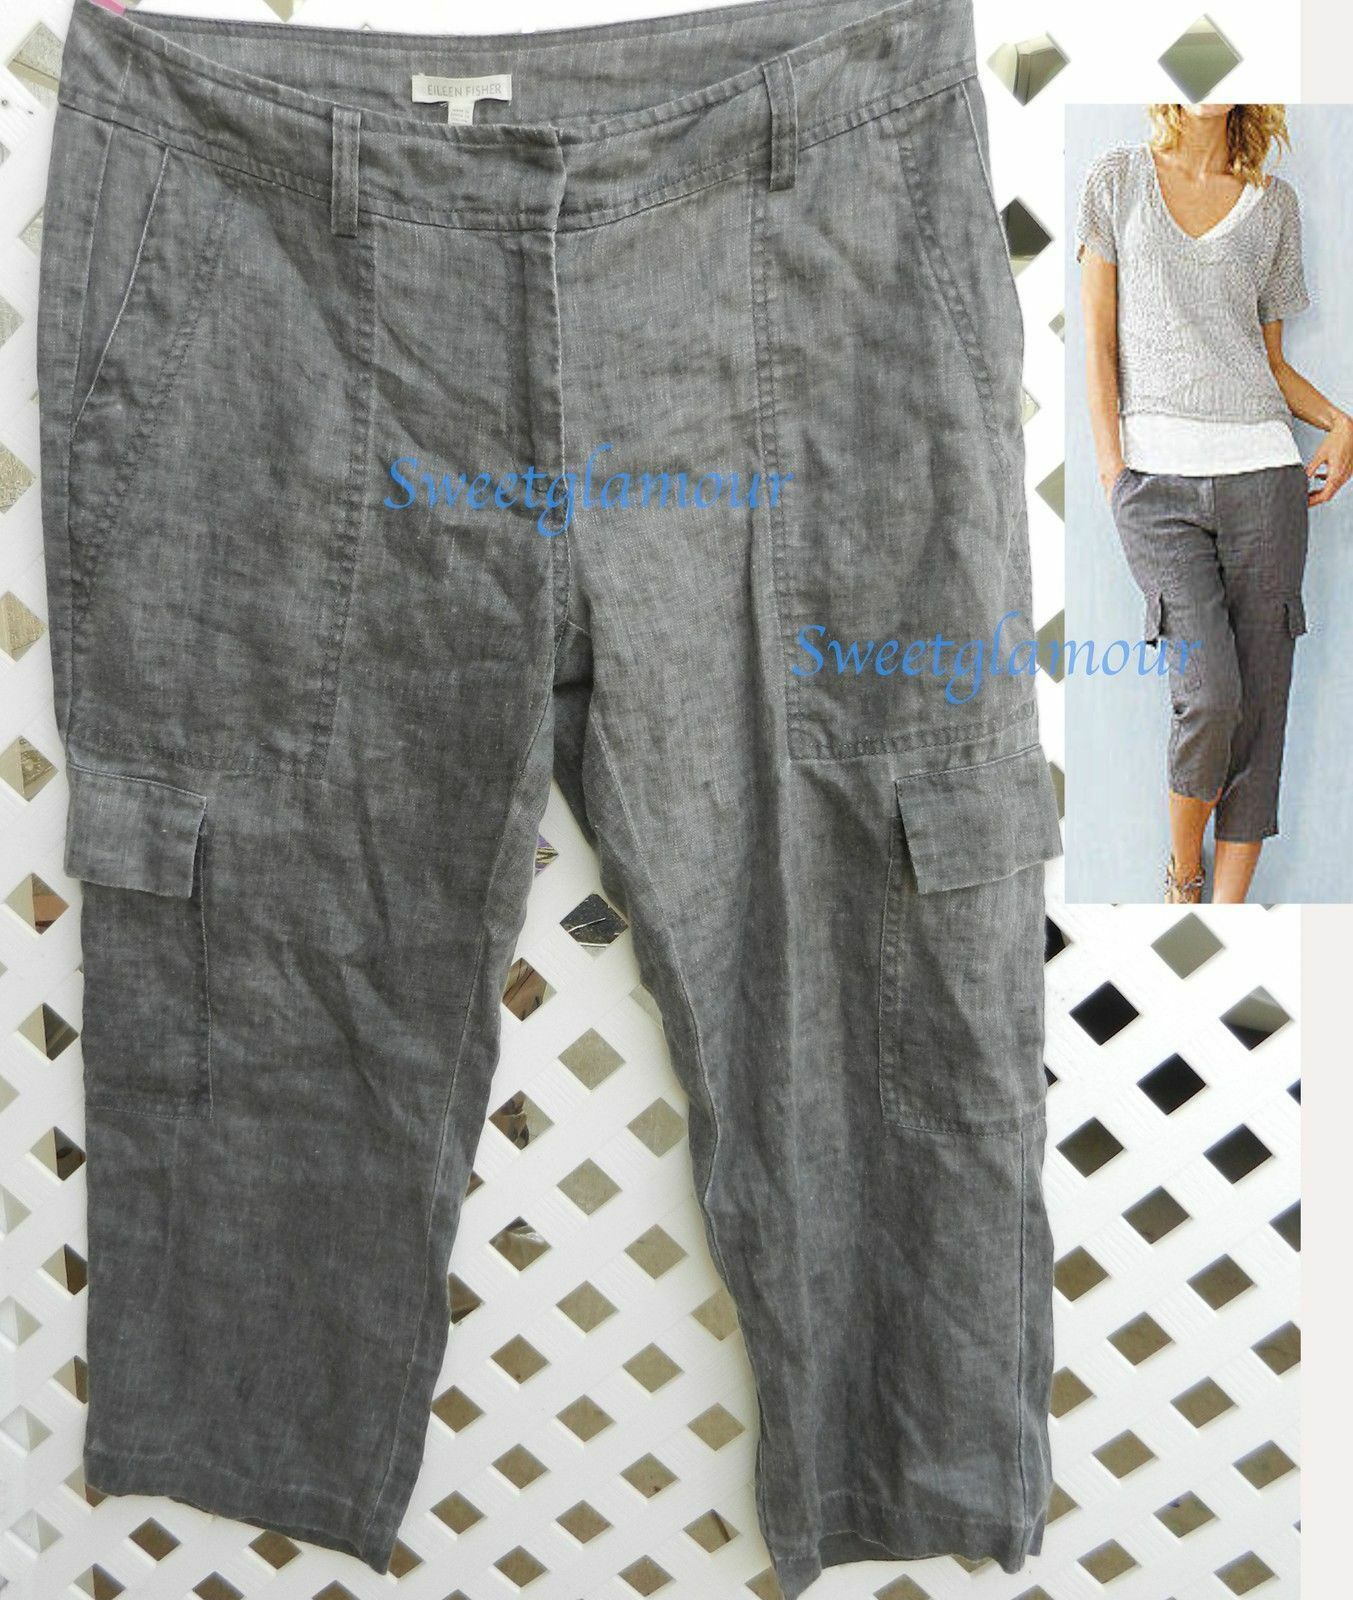 198 Eileen Fisher Dapple Rustic Tinted Linen Dapple Cropped Capri Cargo Pants